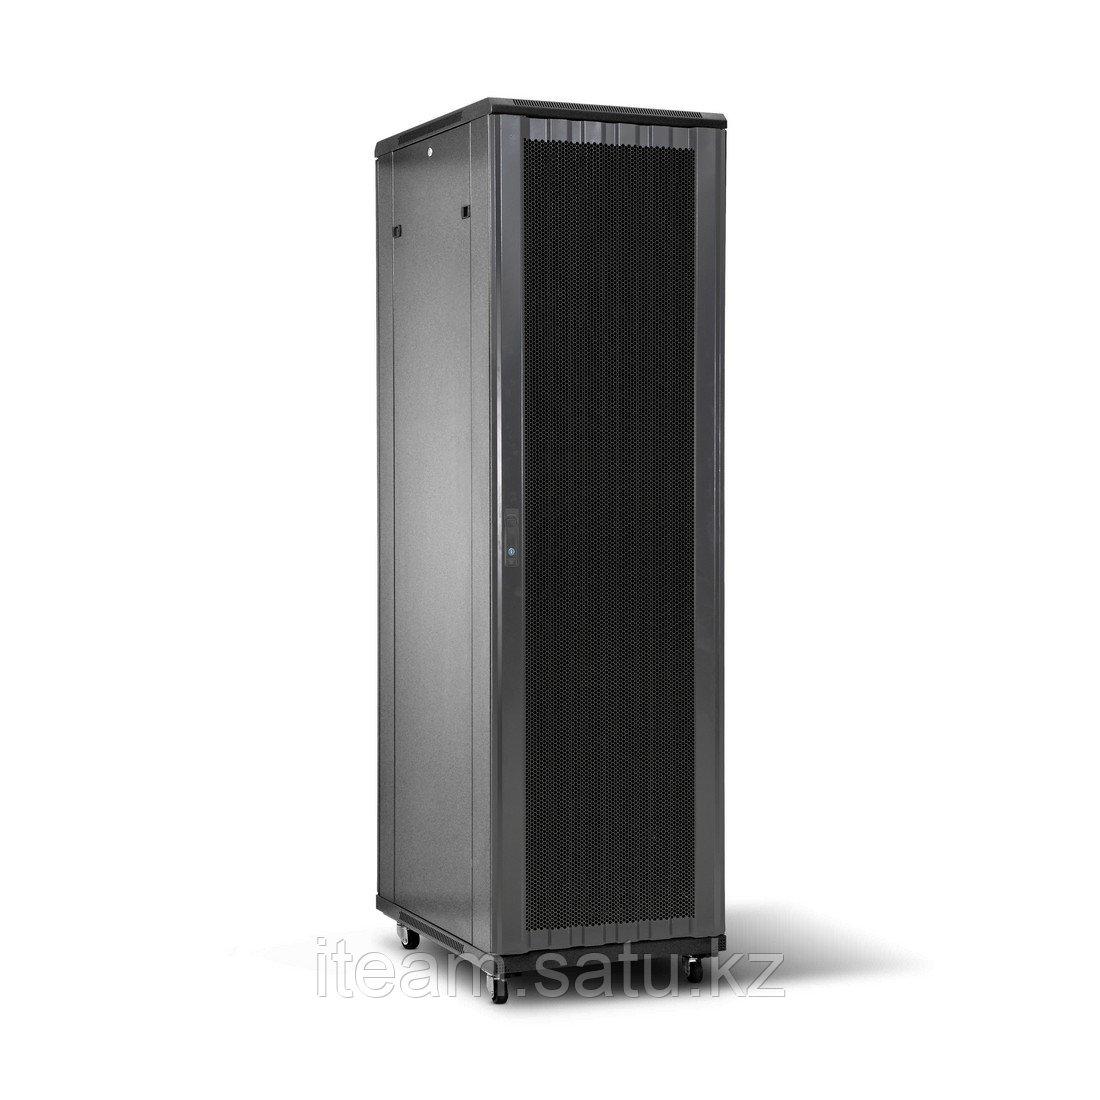 Шкаф серверный SHIP 601S.6824.54.100 24U, 600*800*1200 мм